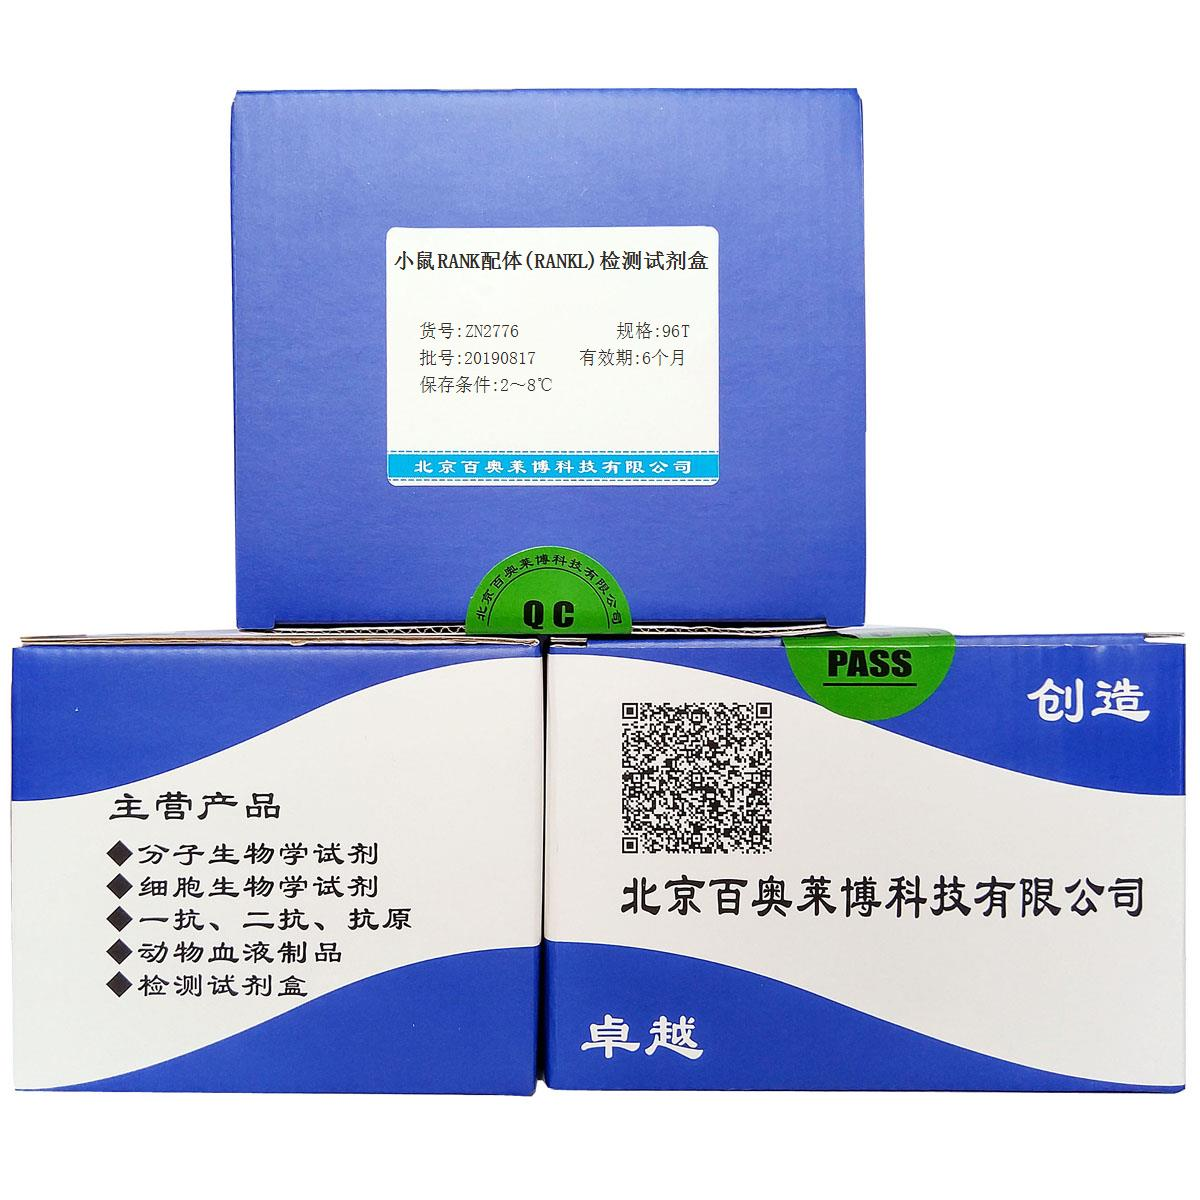 小鼠RANK配体(RANKL)检测试剂盒